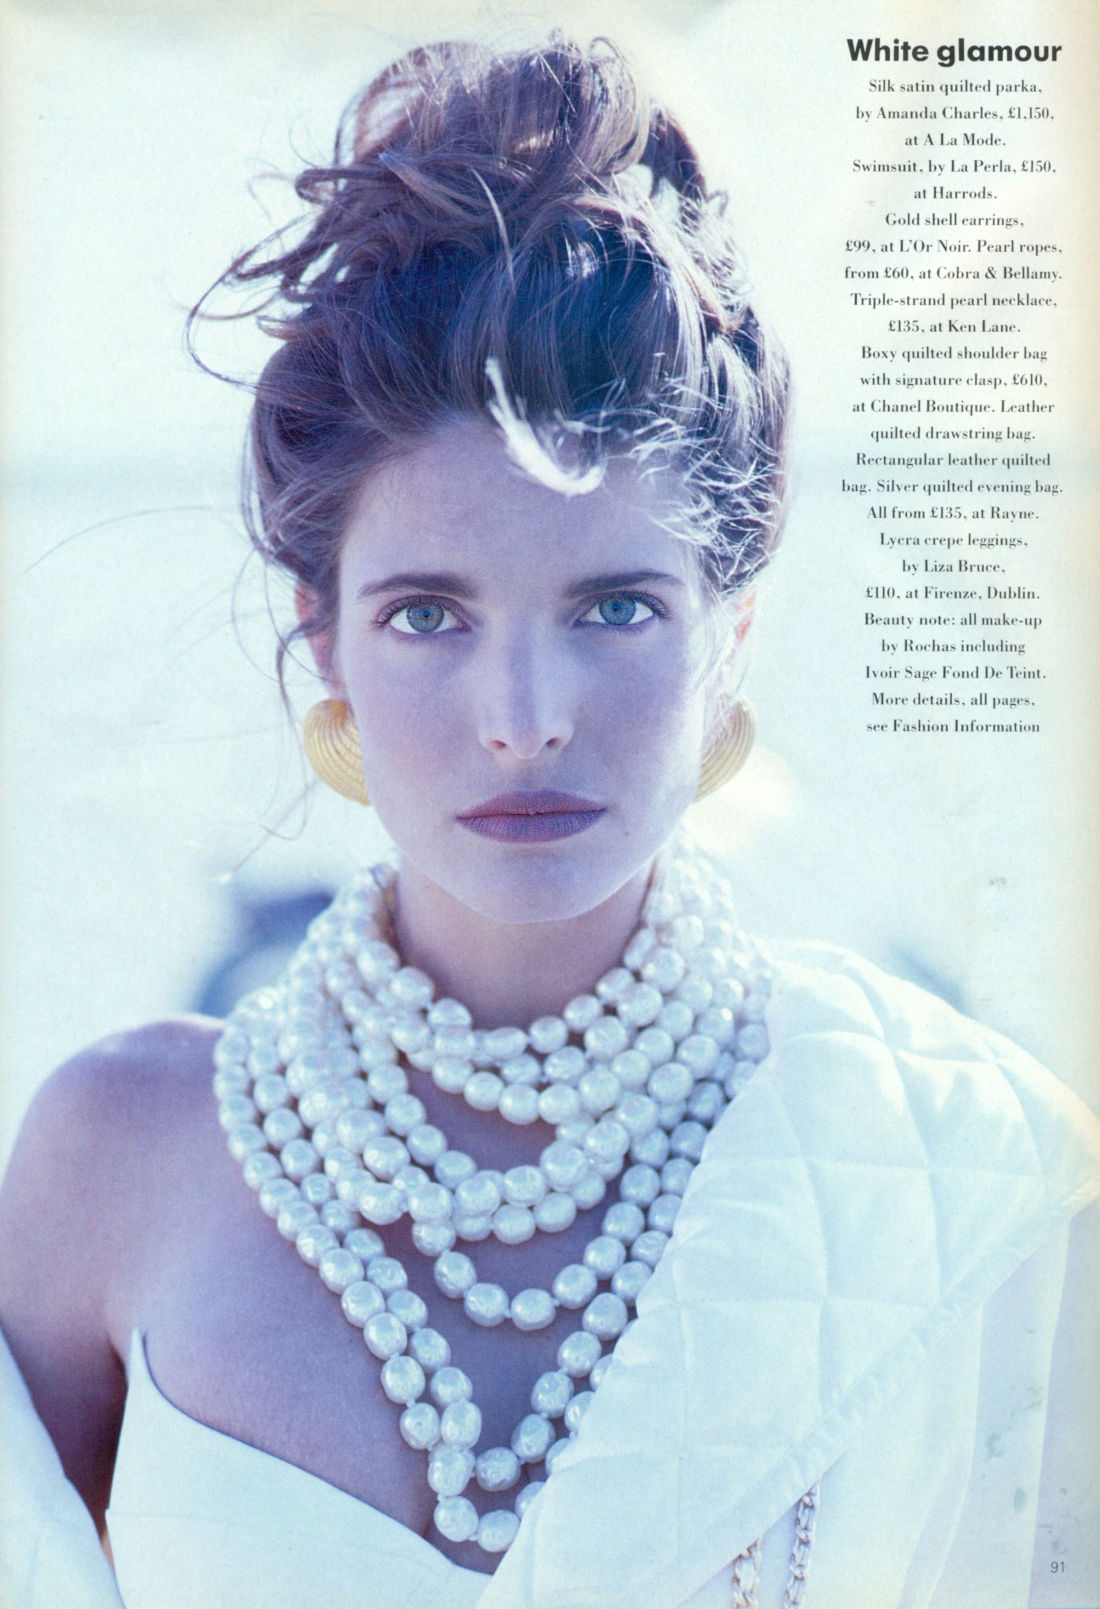 Vogue (UK) July 1990 | Stephanie Seymour 08.jpg